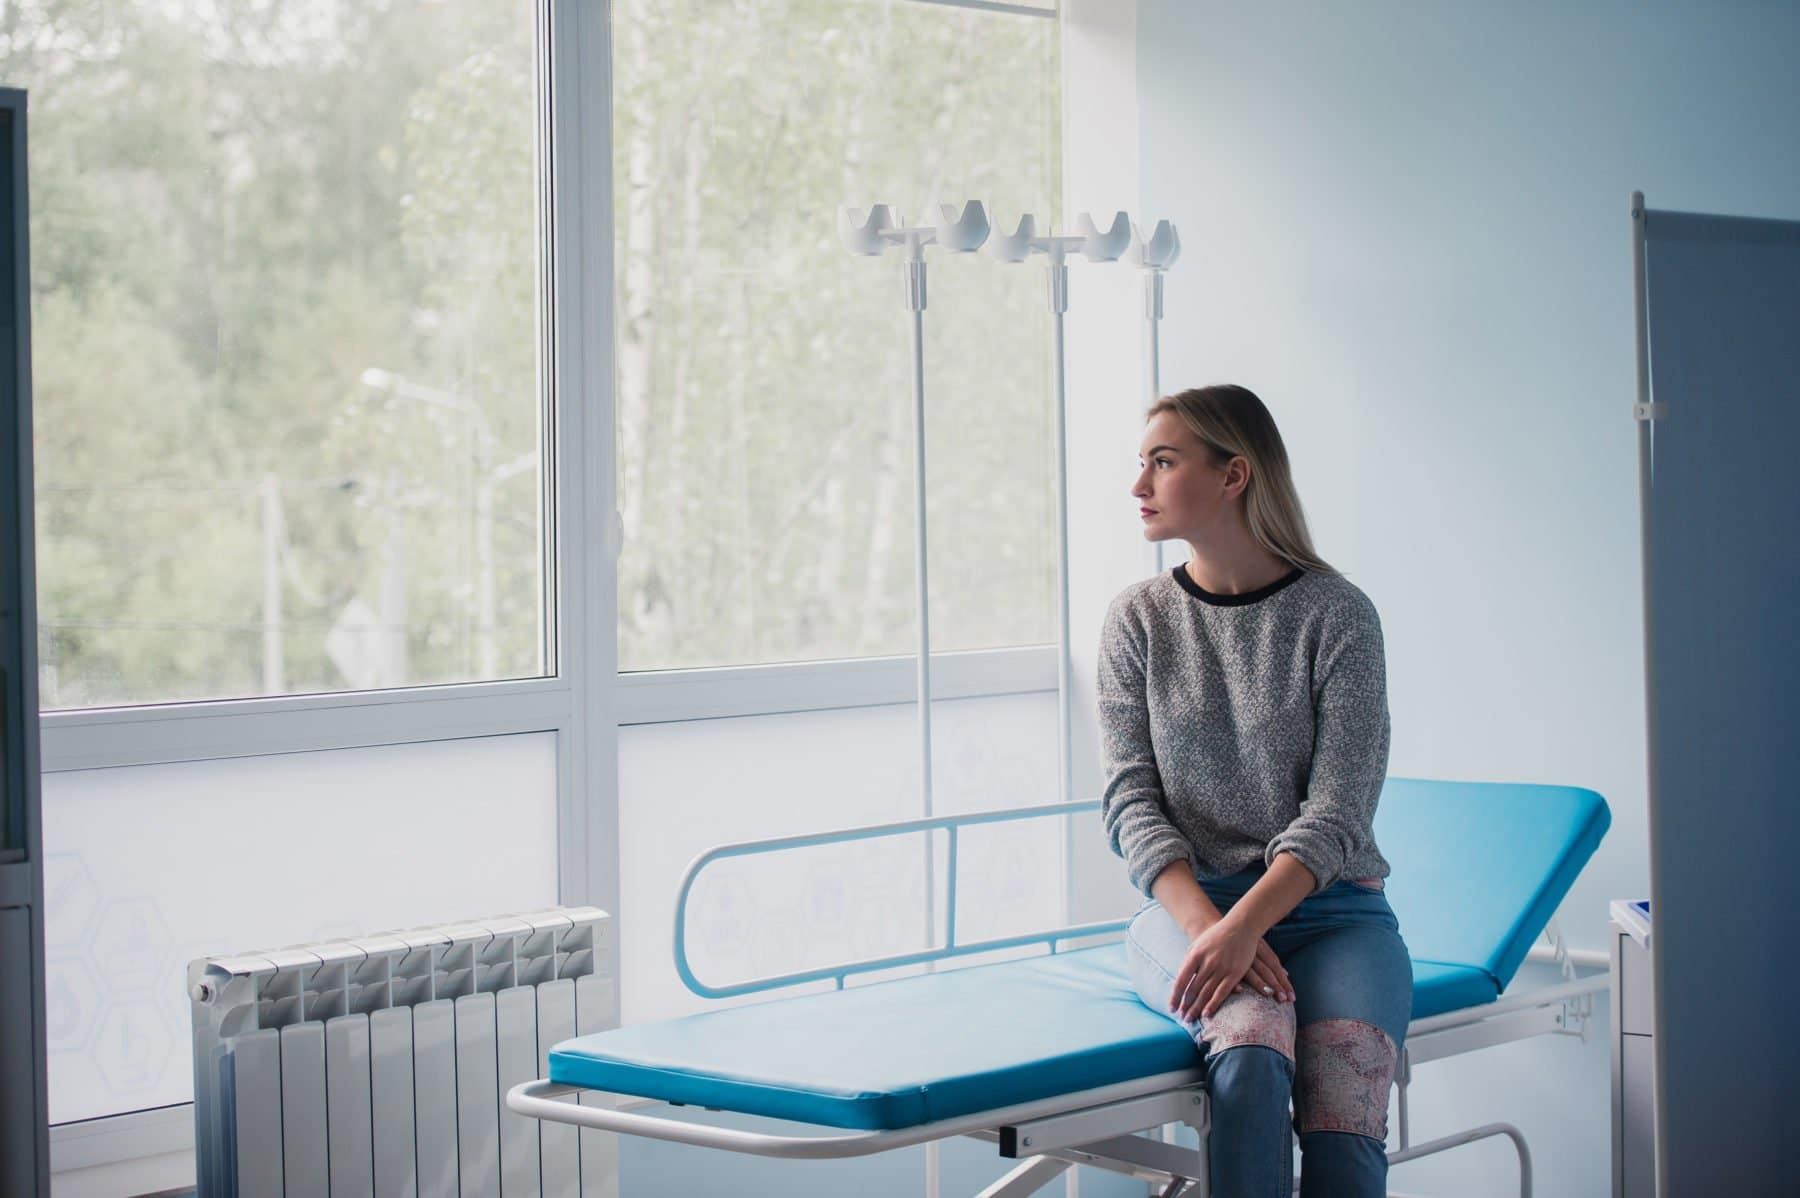 Girl at Doctors